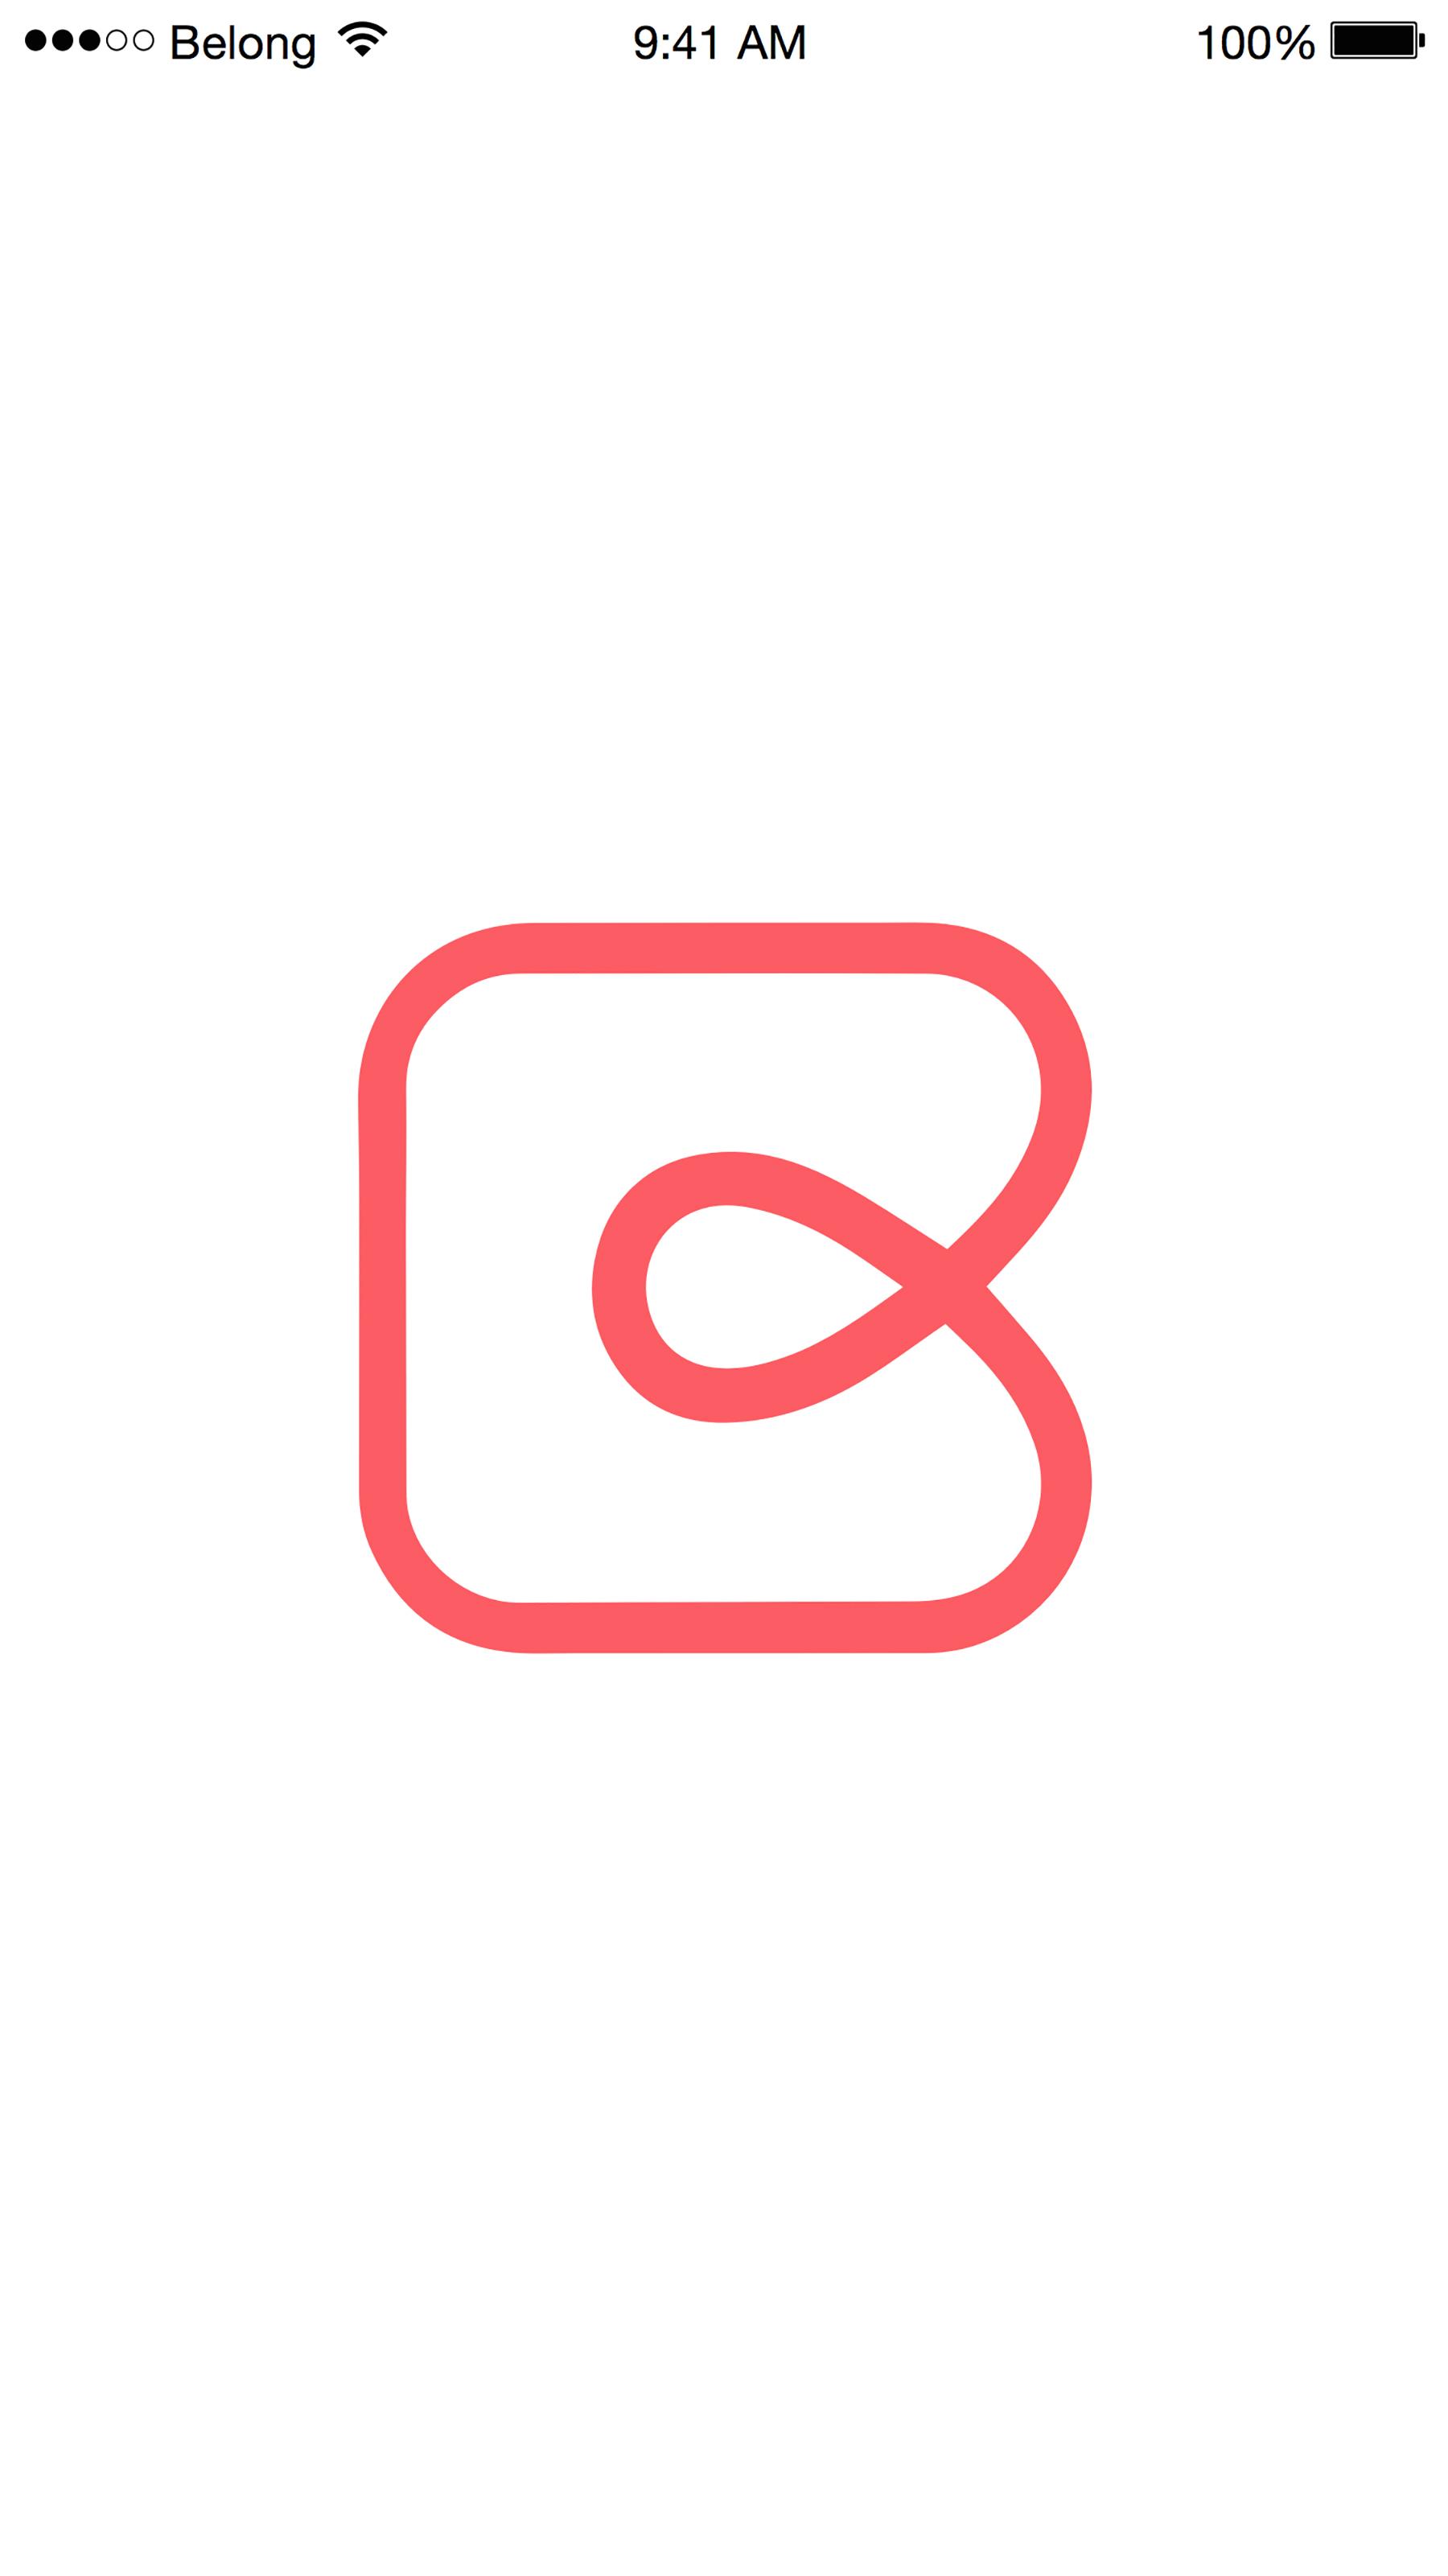 airbnb-7.jpg